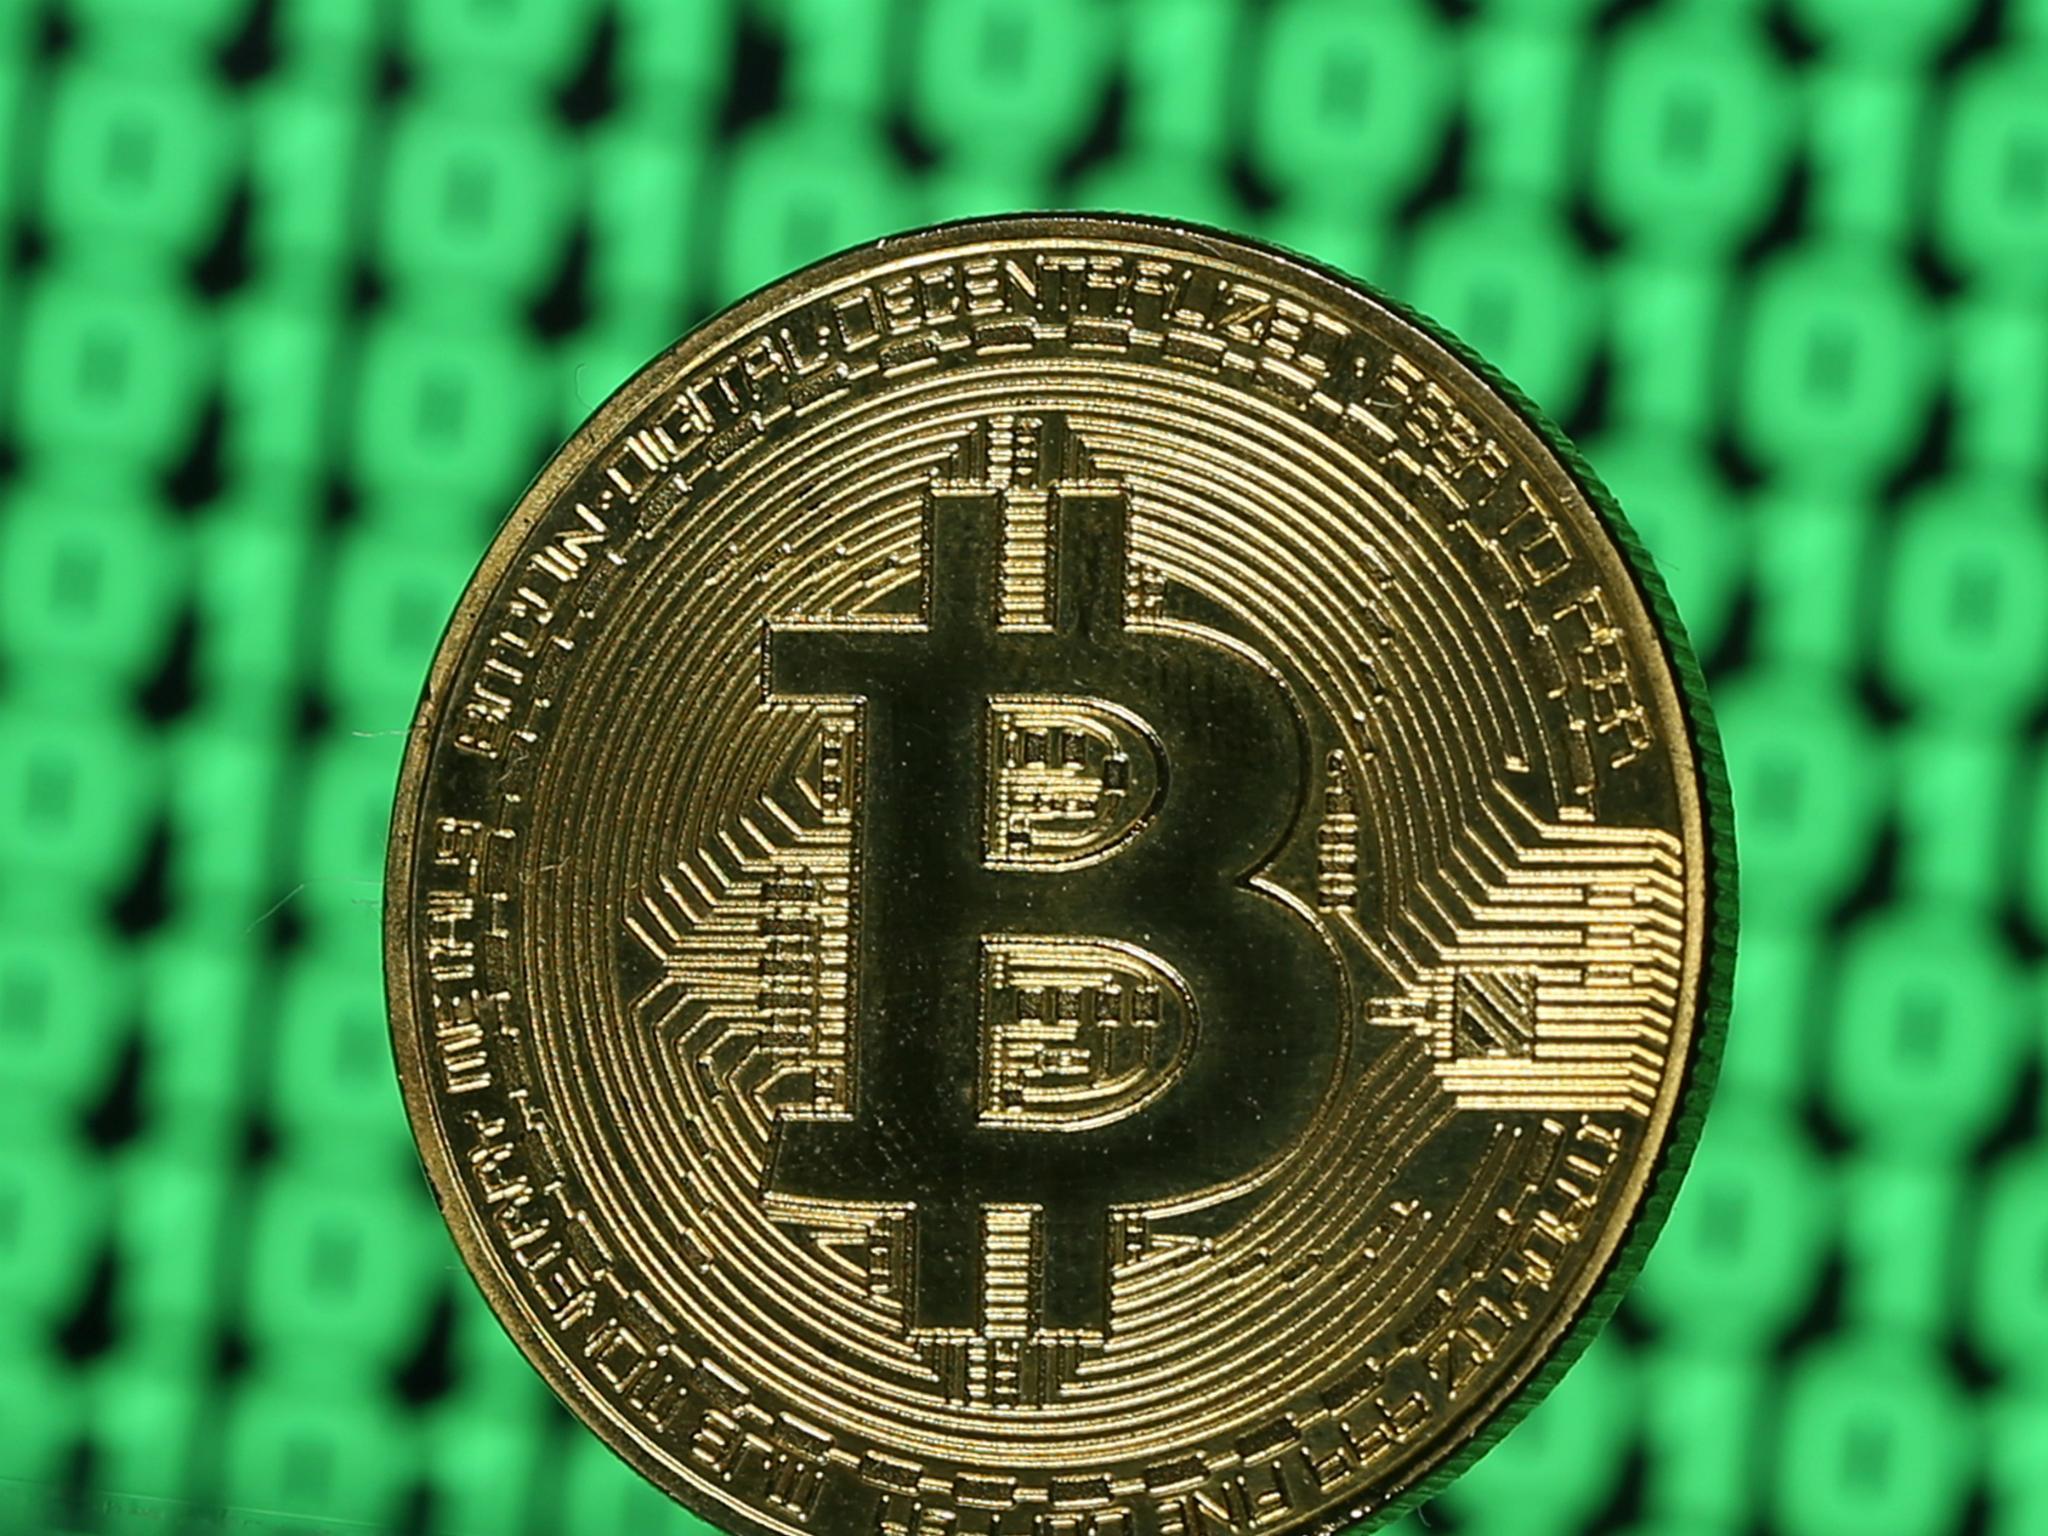 Bitcoin price surge may be helping North Korea raise money